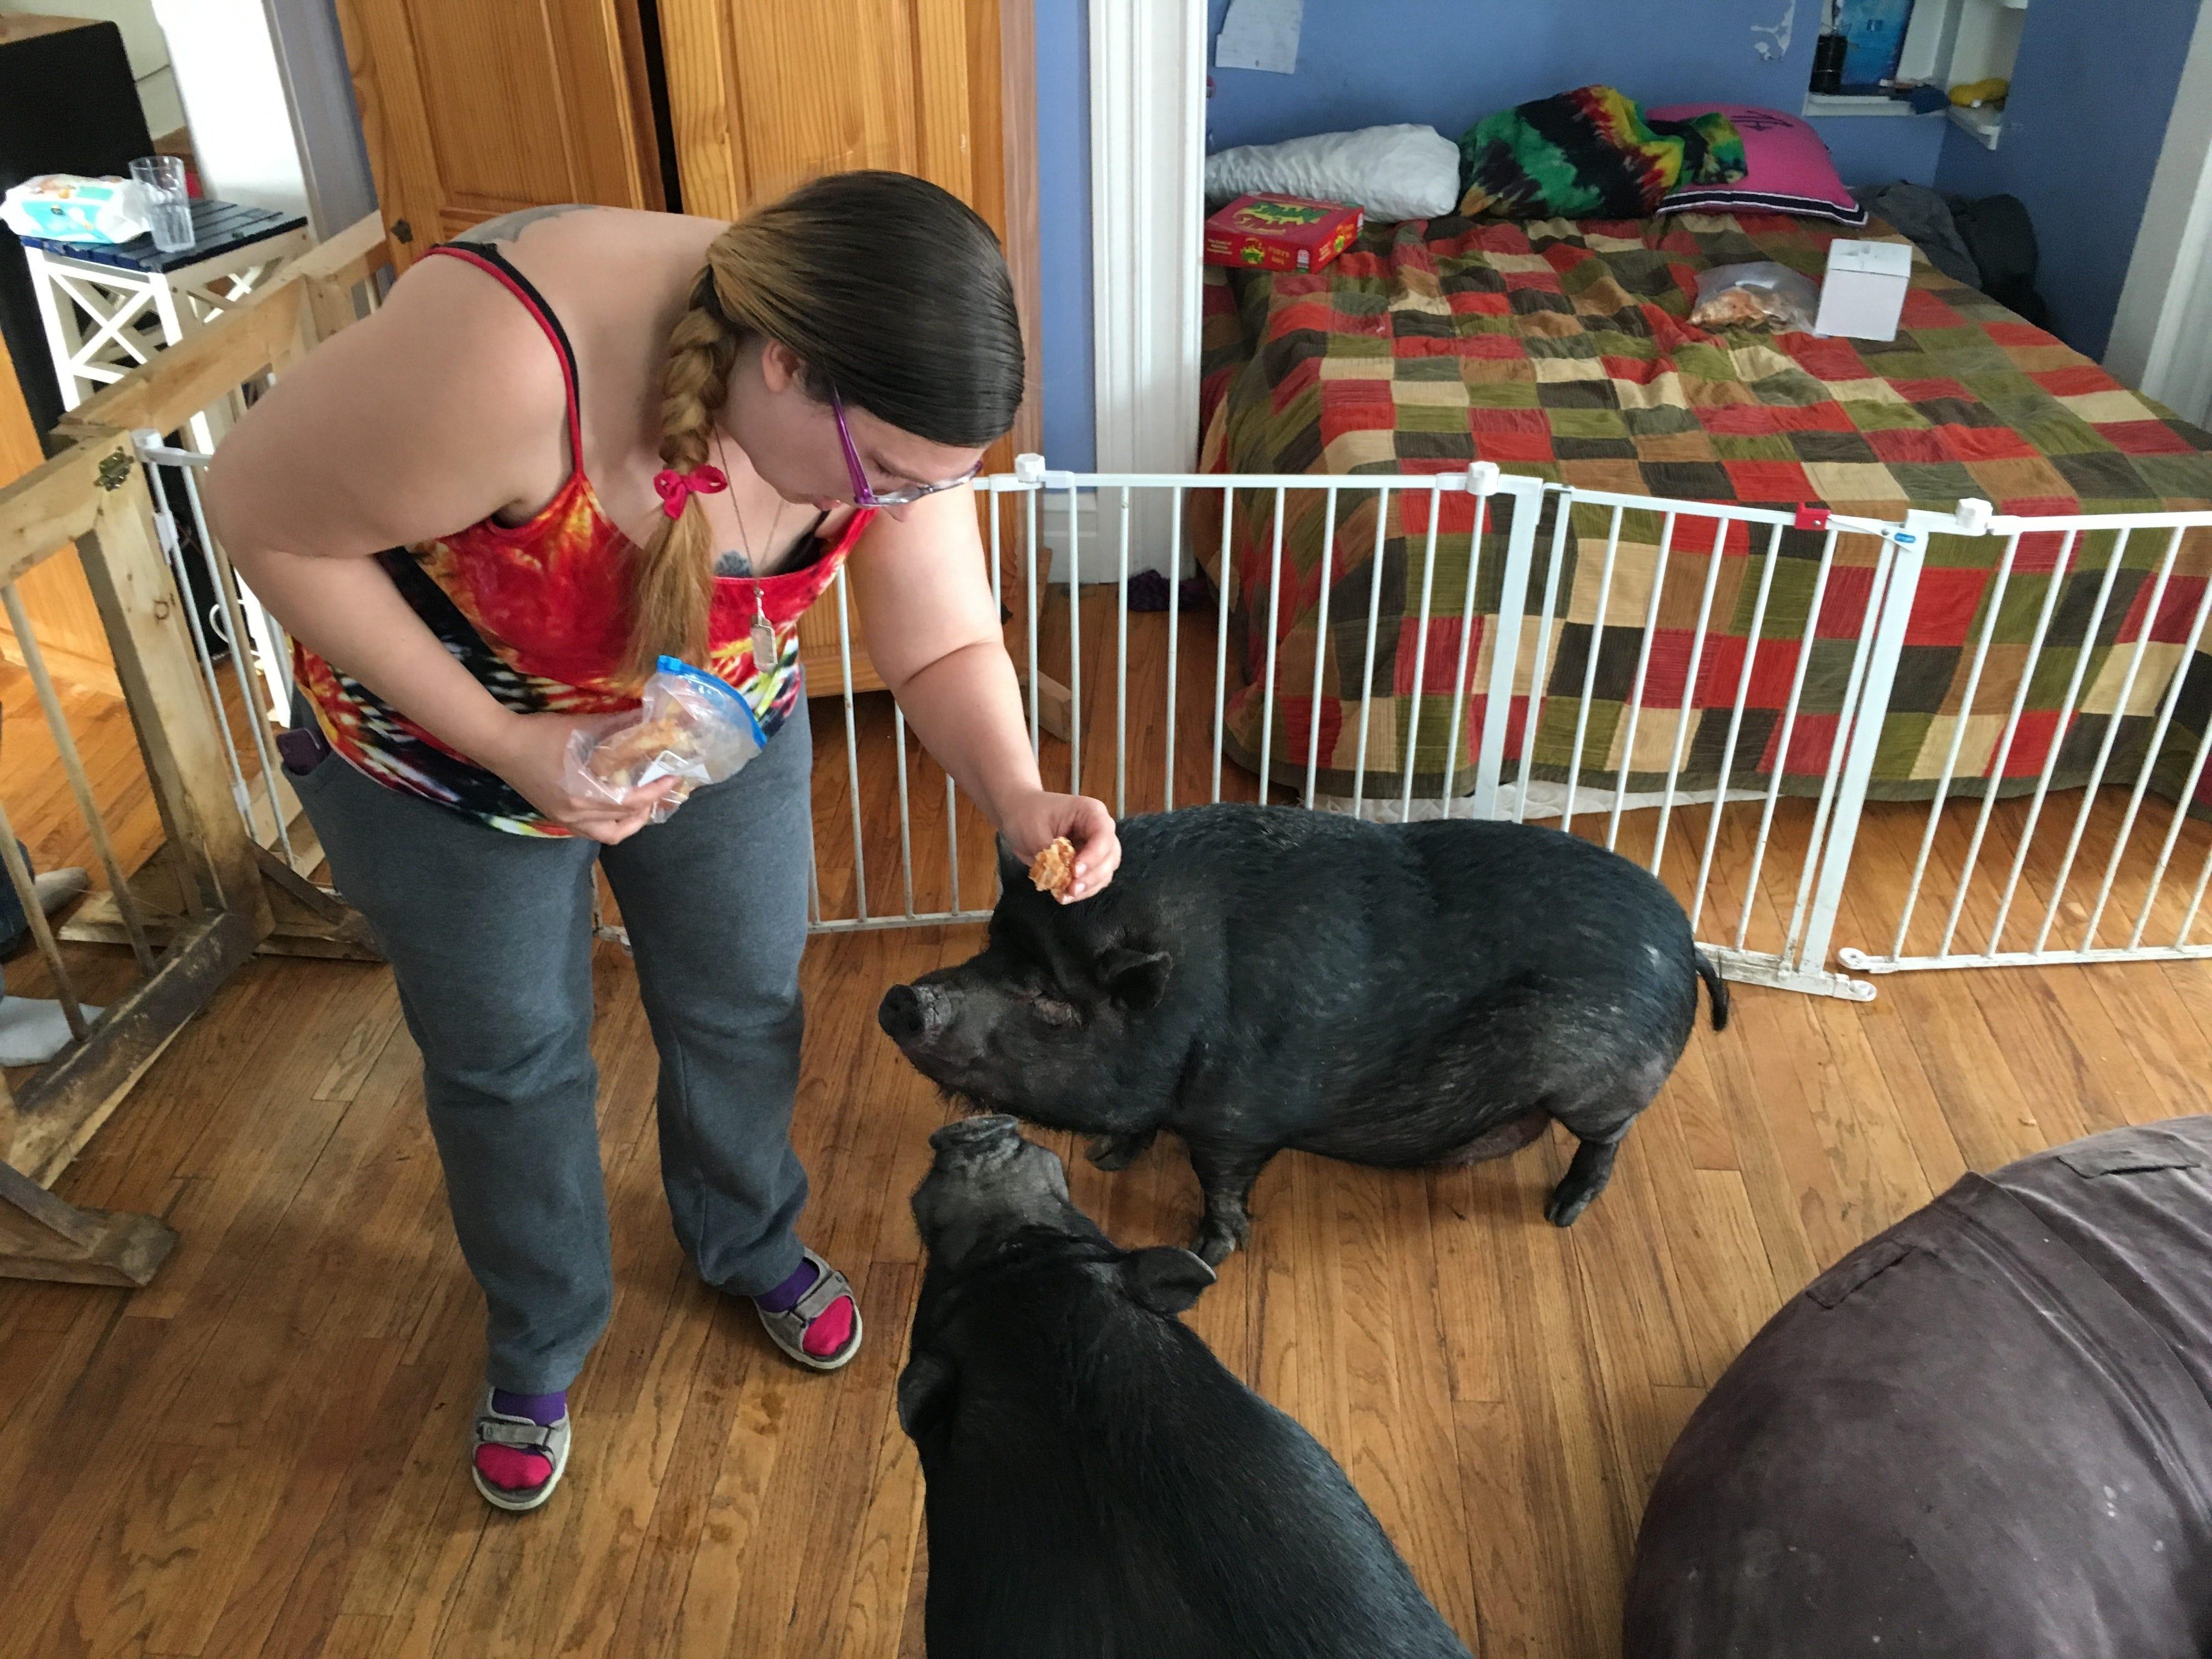 Judge orders Ypsilanti family to remove 3 potbellied pigs   Detroit Free Press